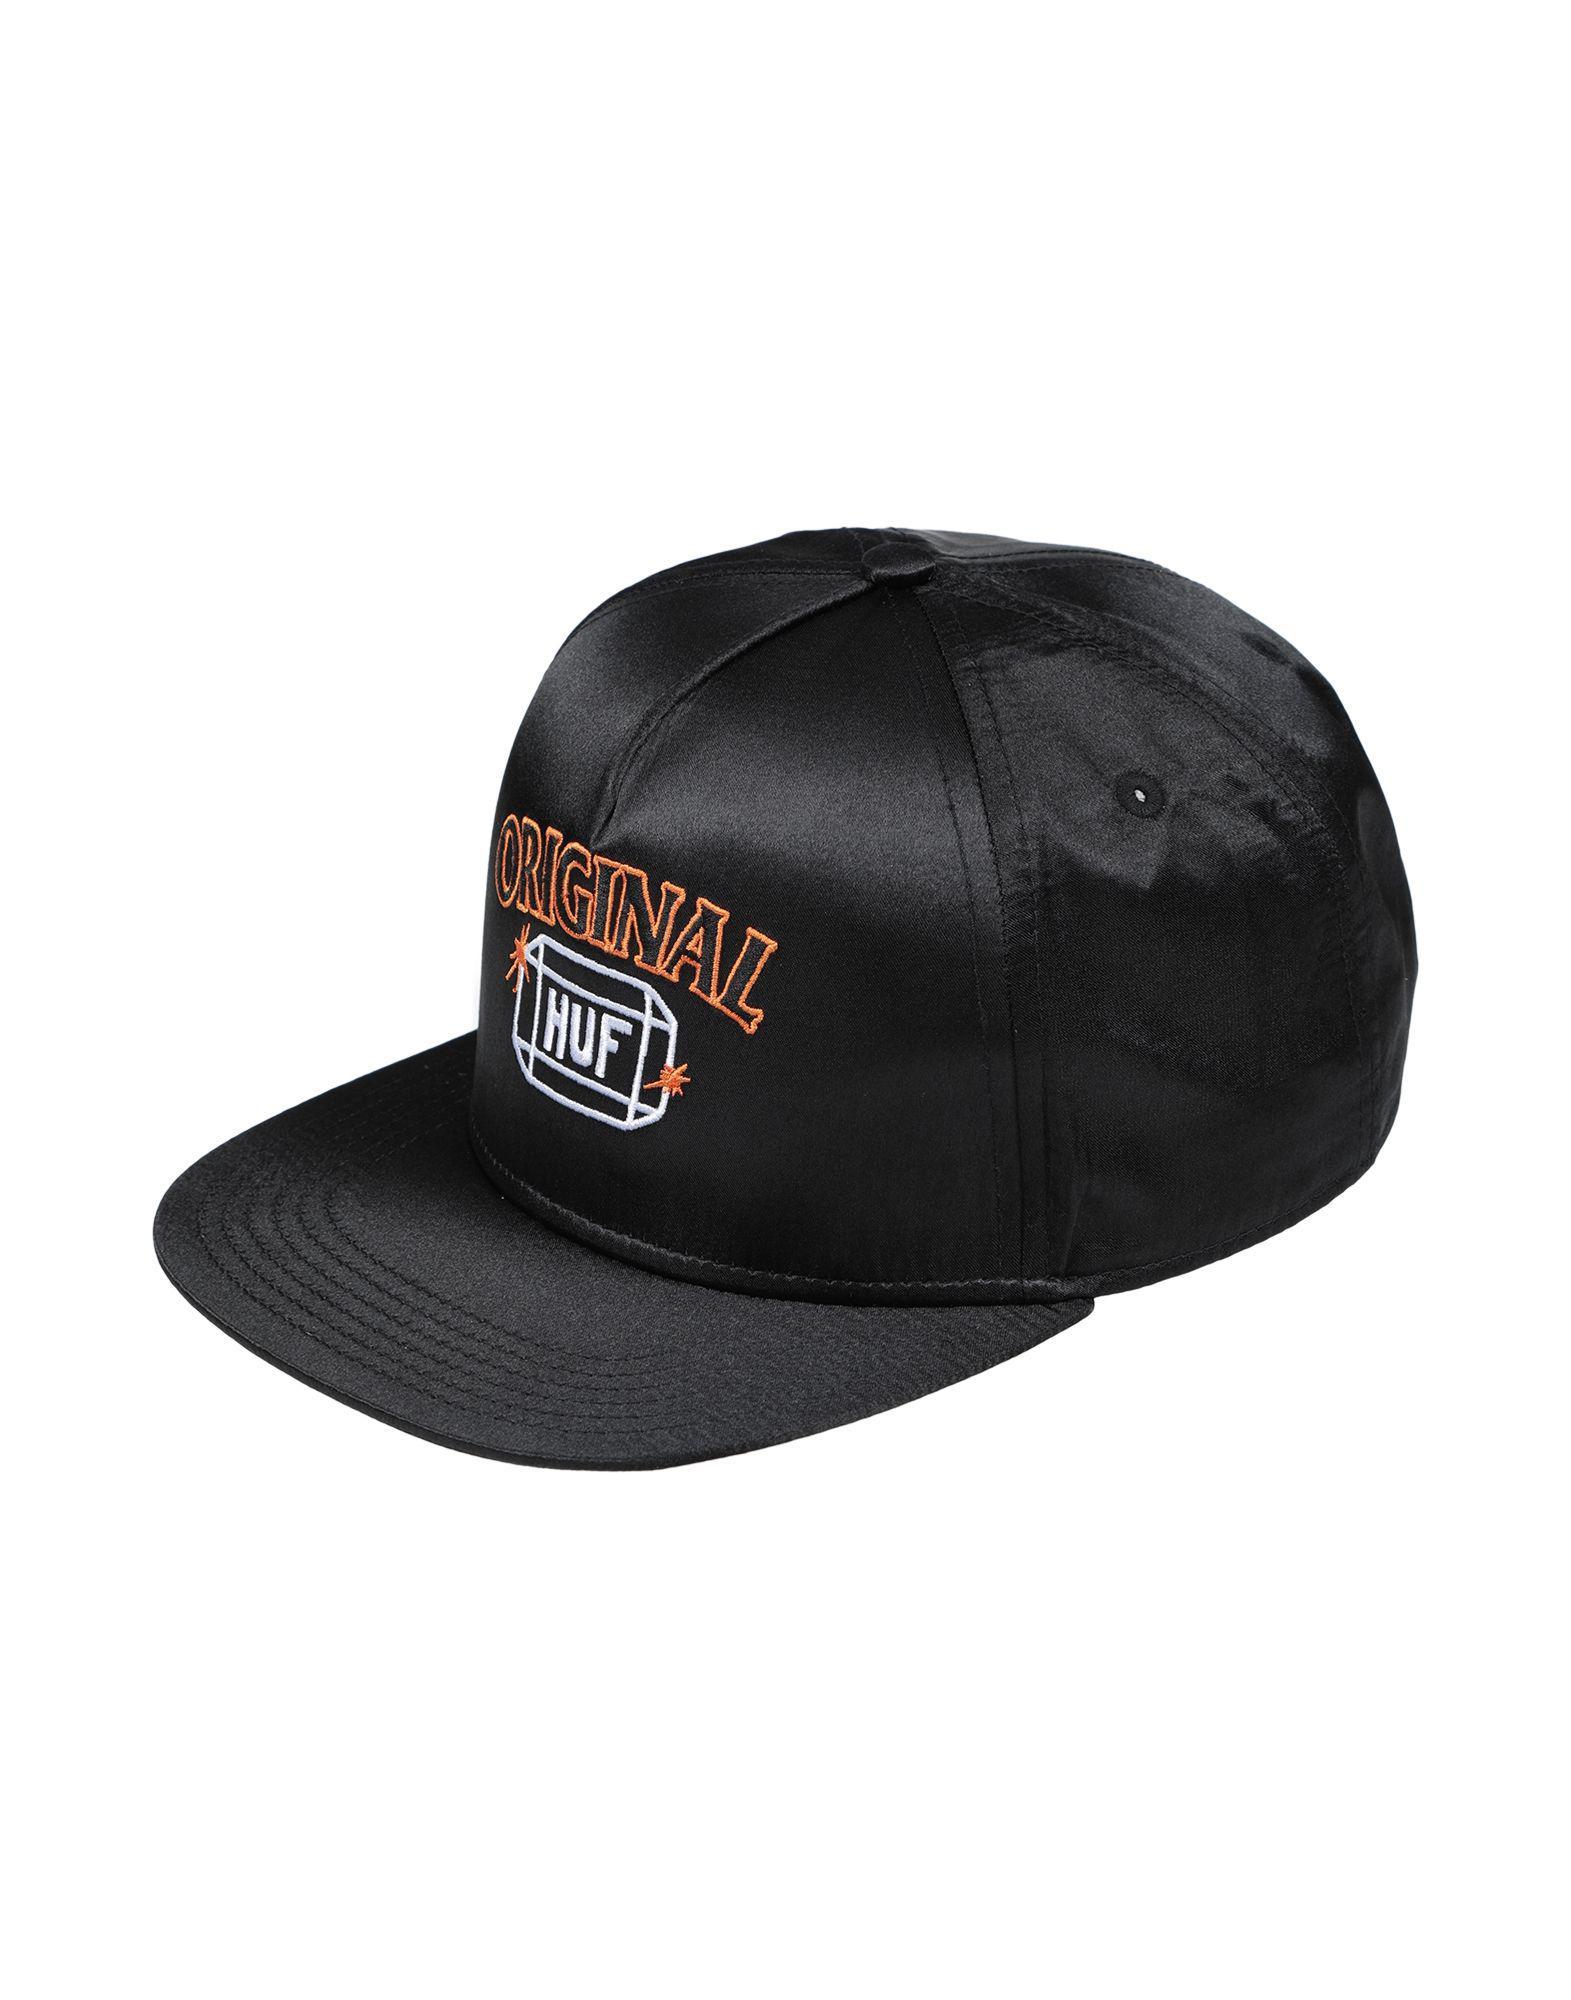 4a6b545b228ca Huf Hat in Black for Men - Lyst